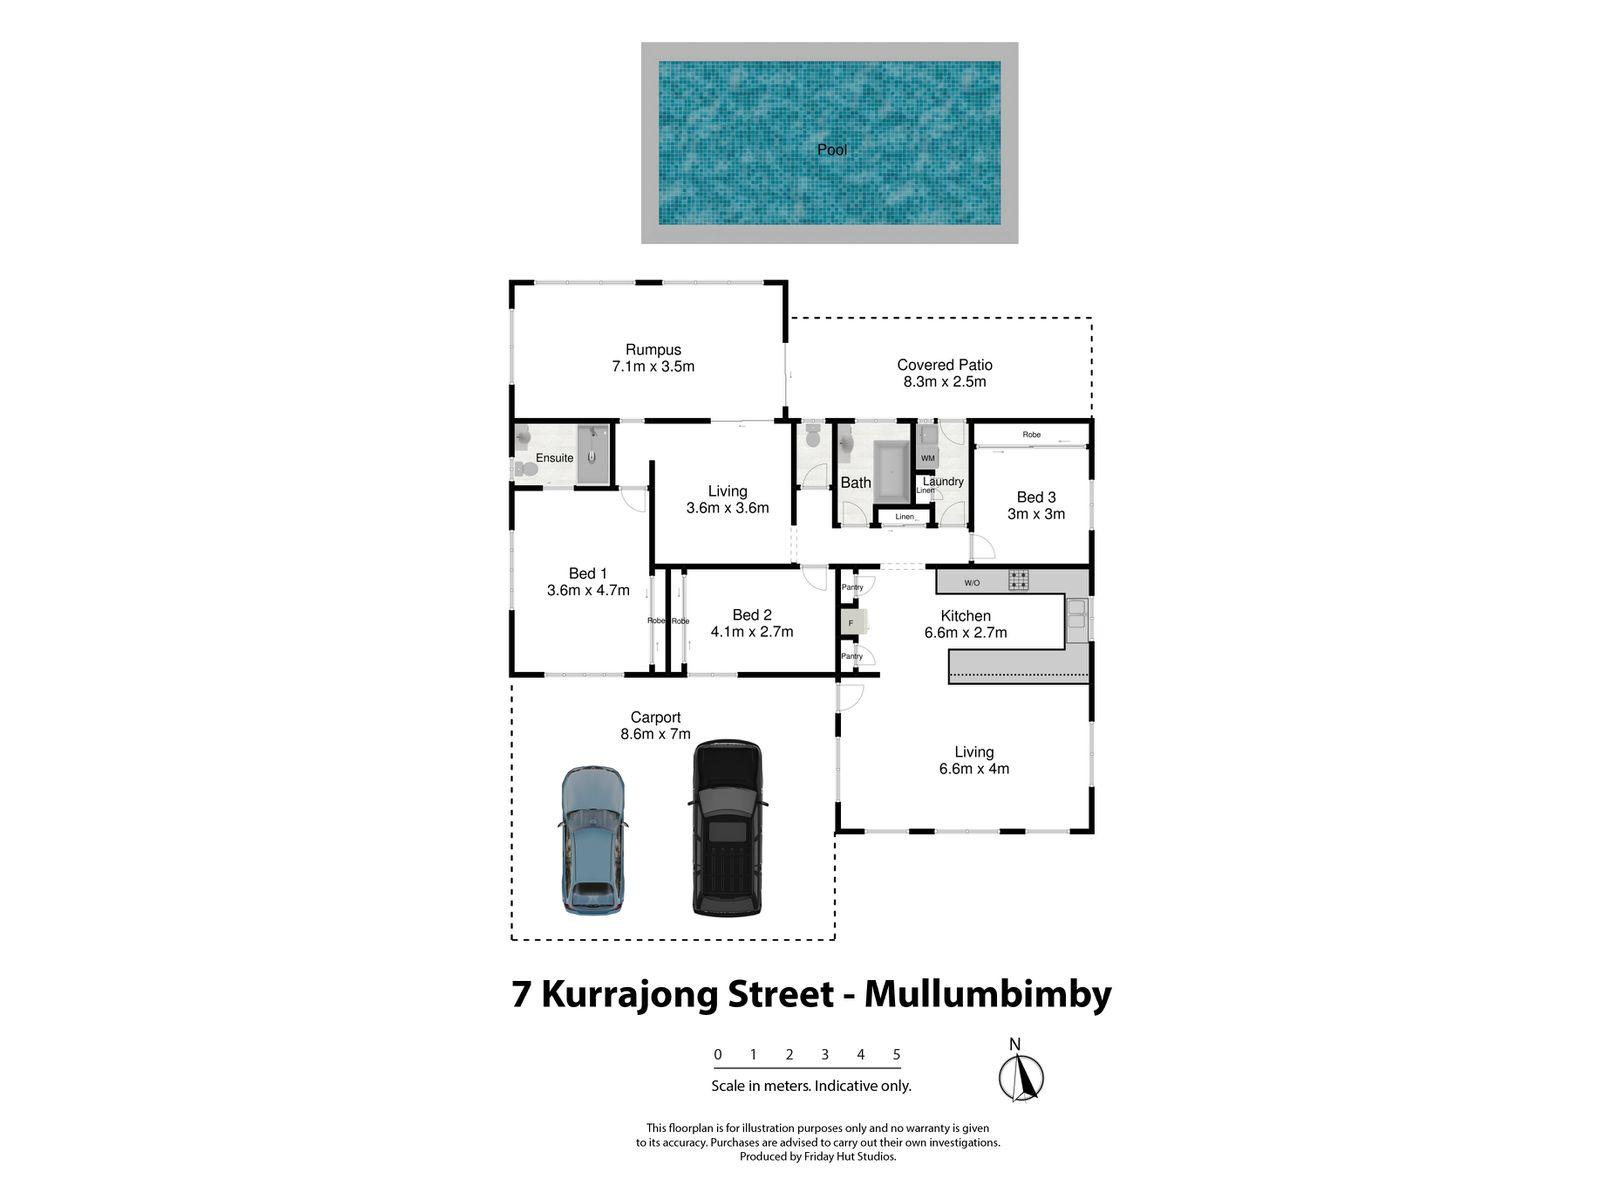 7 Kurrajong Street, Mullumbimby